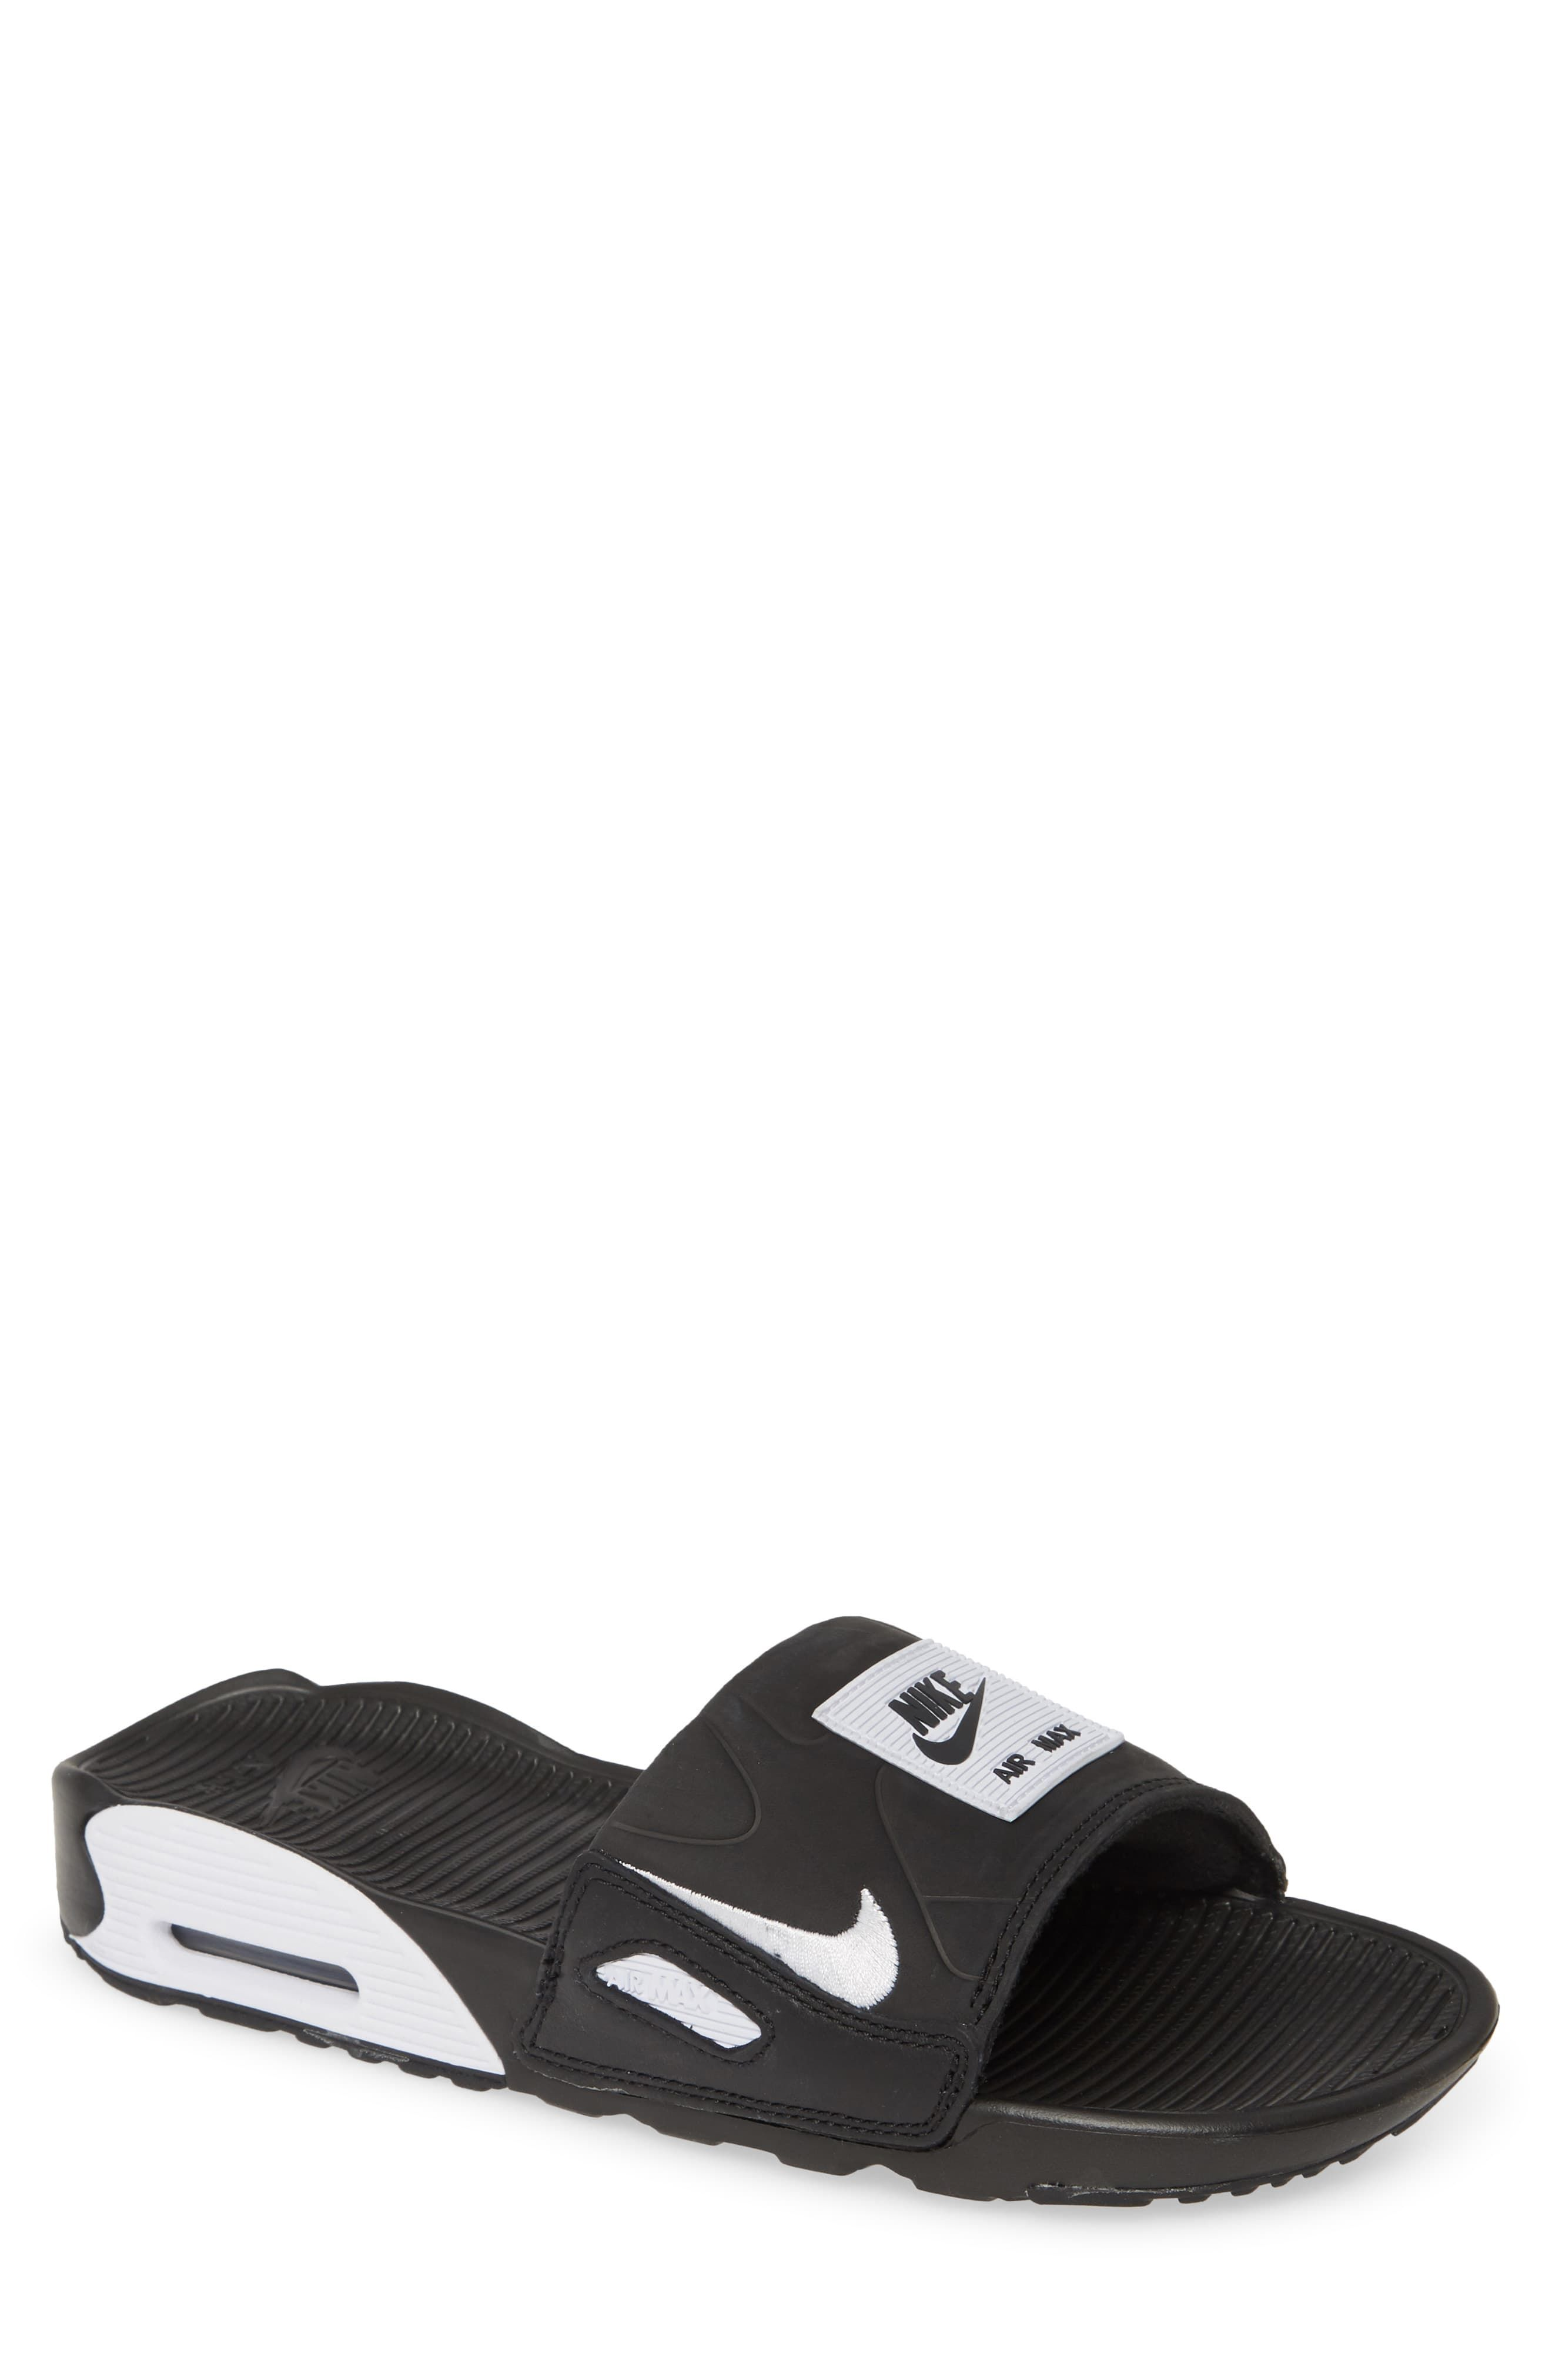 Nike Air Max 90 Sport Slide (Women)   Nordstrom   Nike air max 90 ...